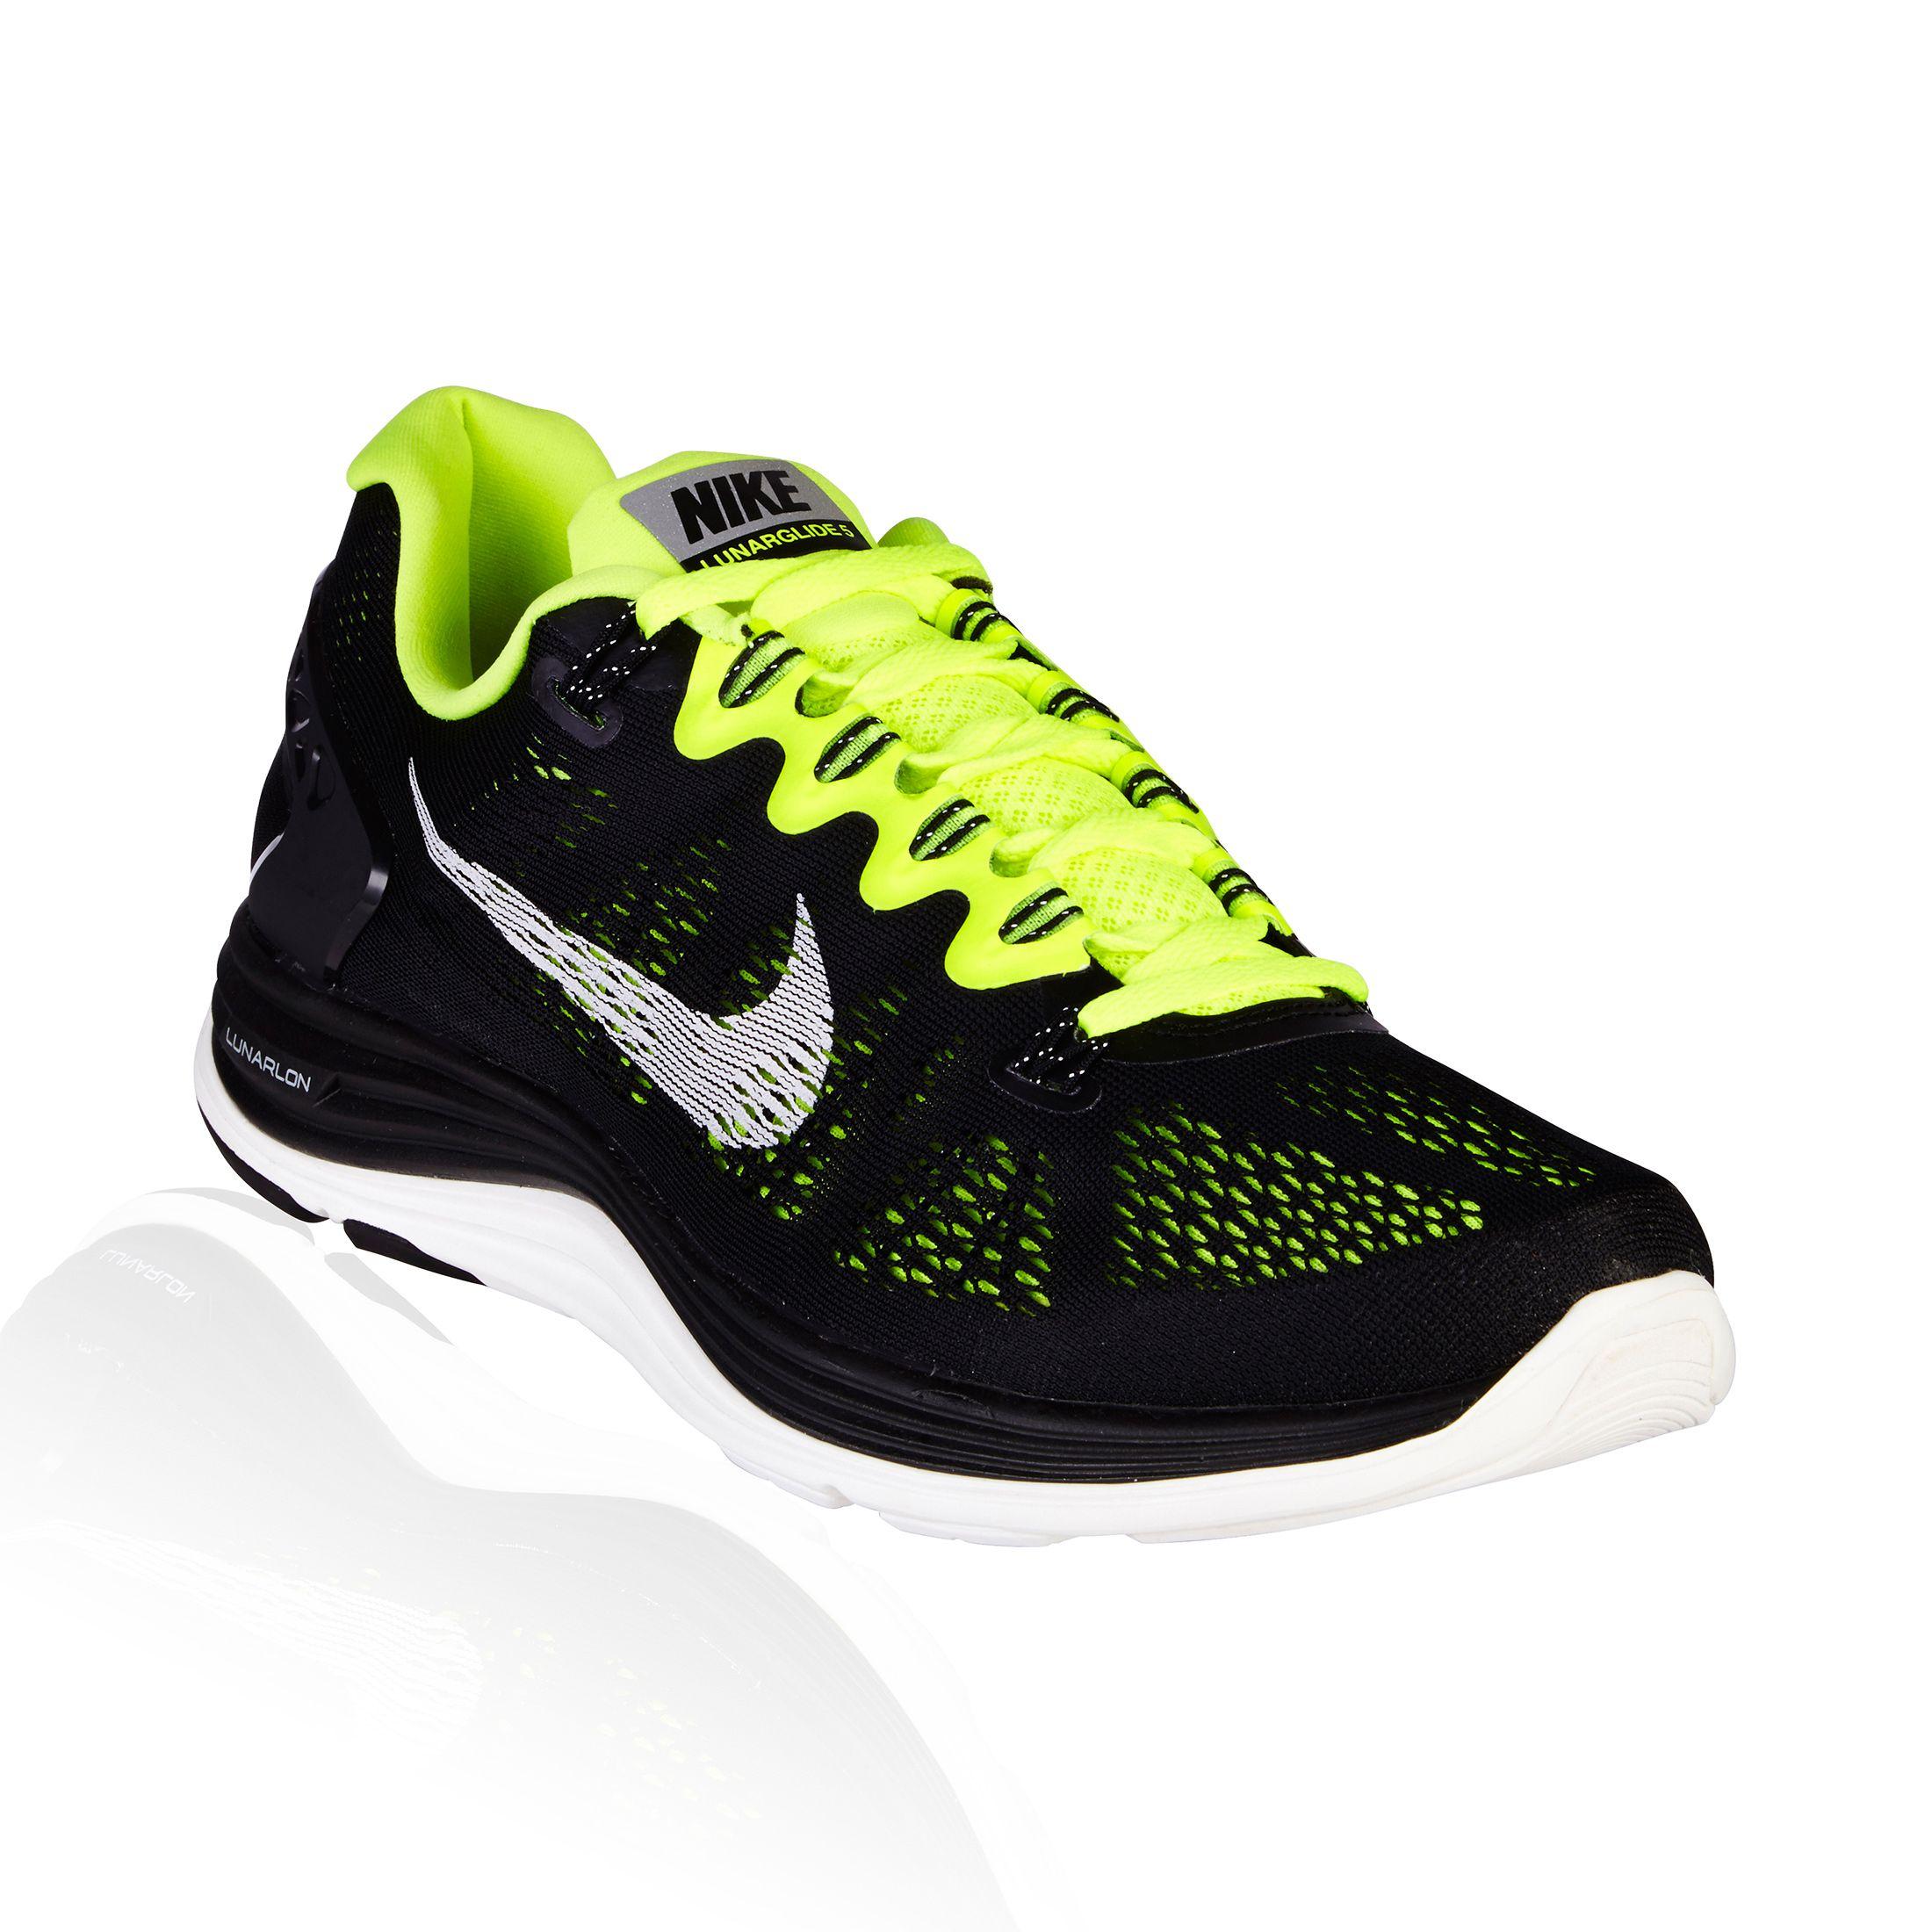 promo code 71420 47666 wholesale nike lunarglide 6 chaussure de running pour femme 155ff b3e78  ebay  nike store it nike lunarglide 5 thenextpair 5c88d cd725